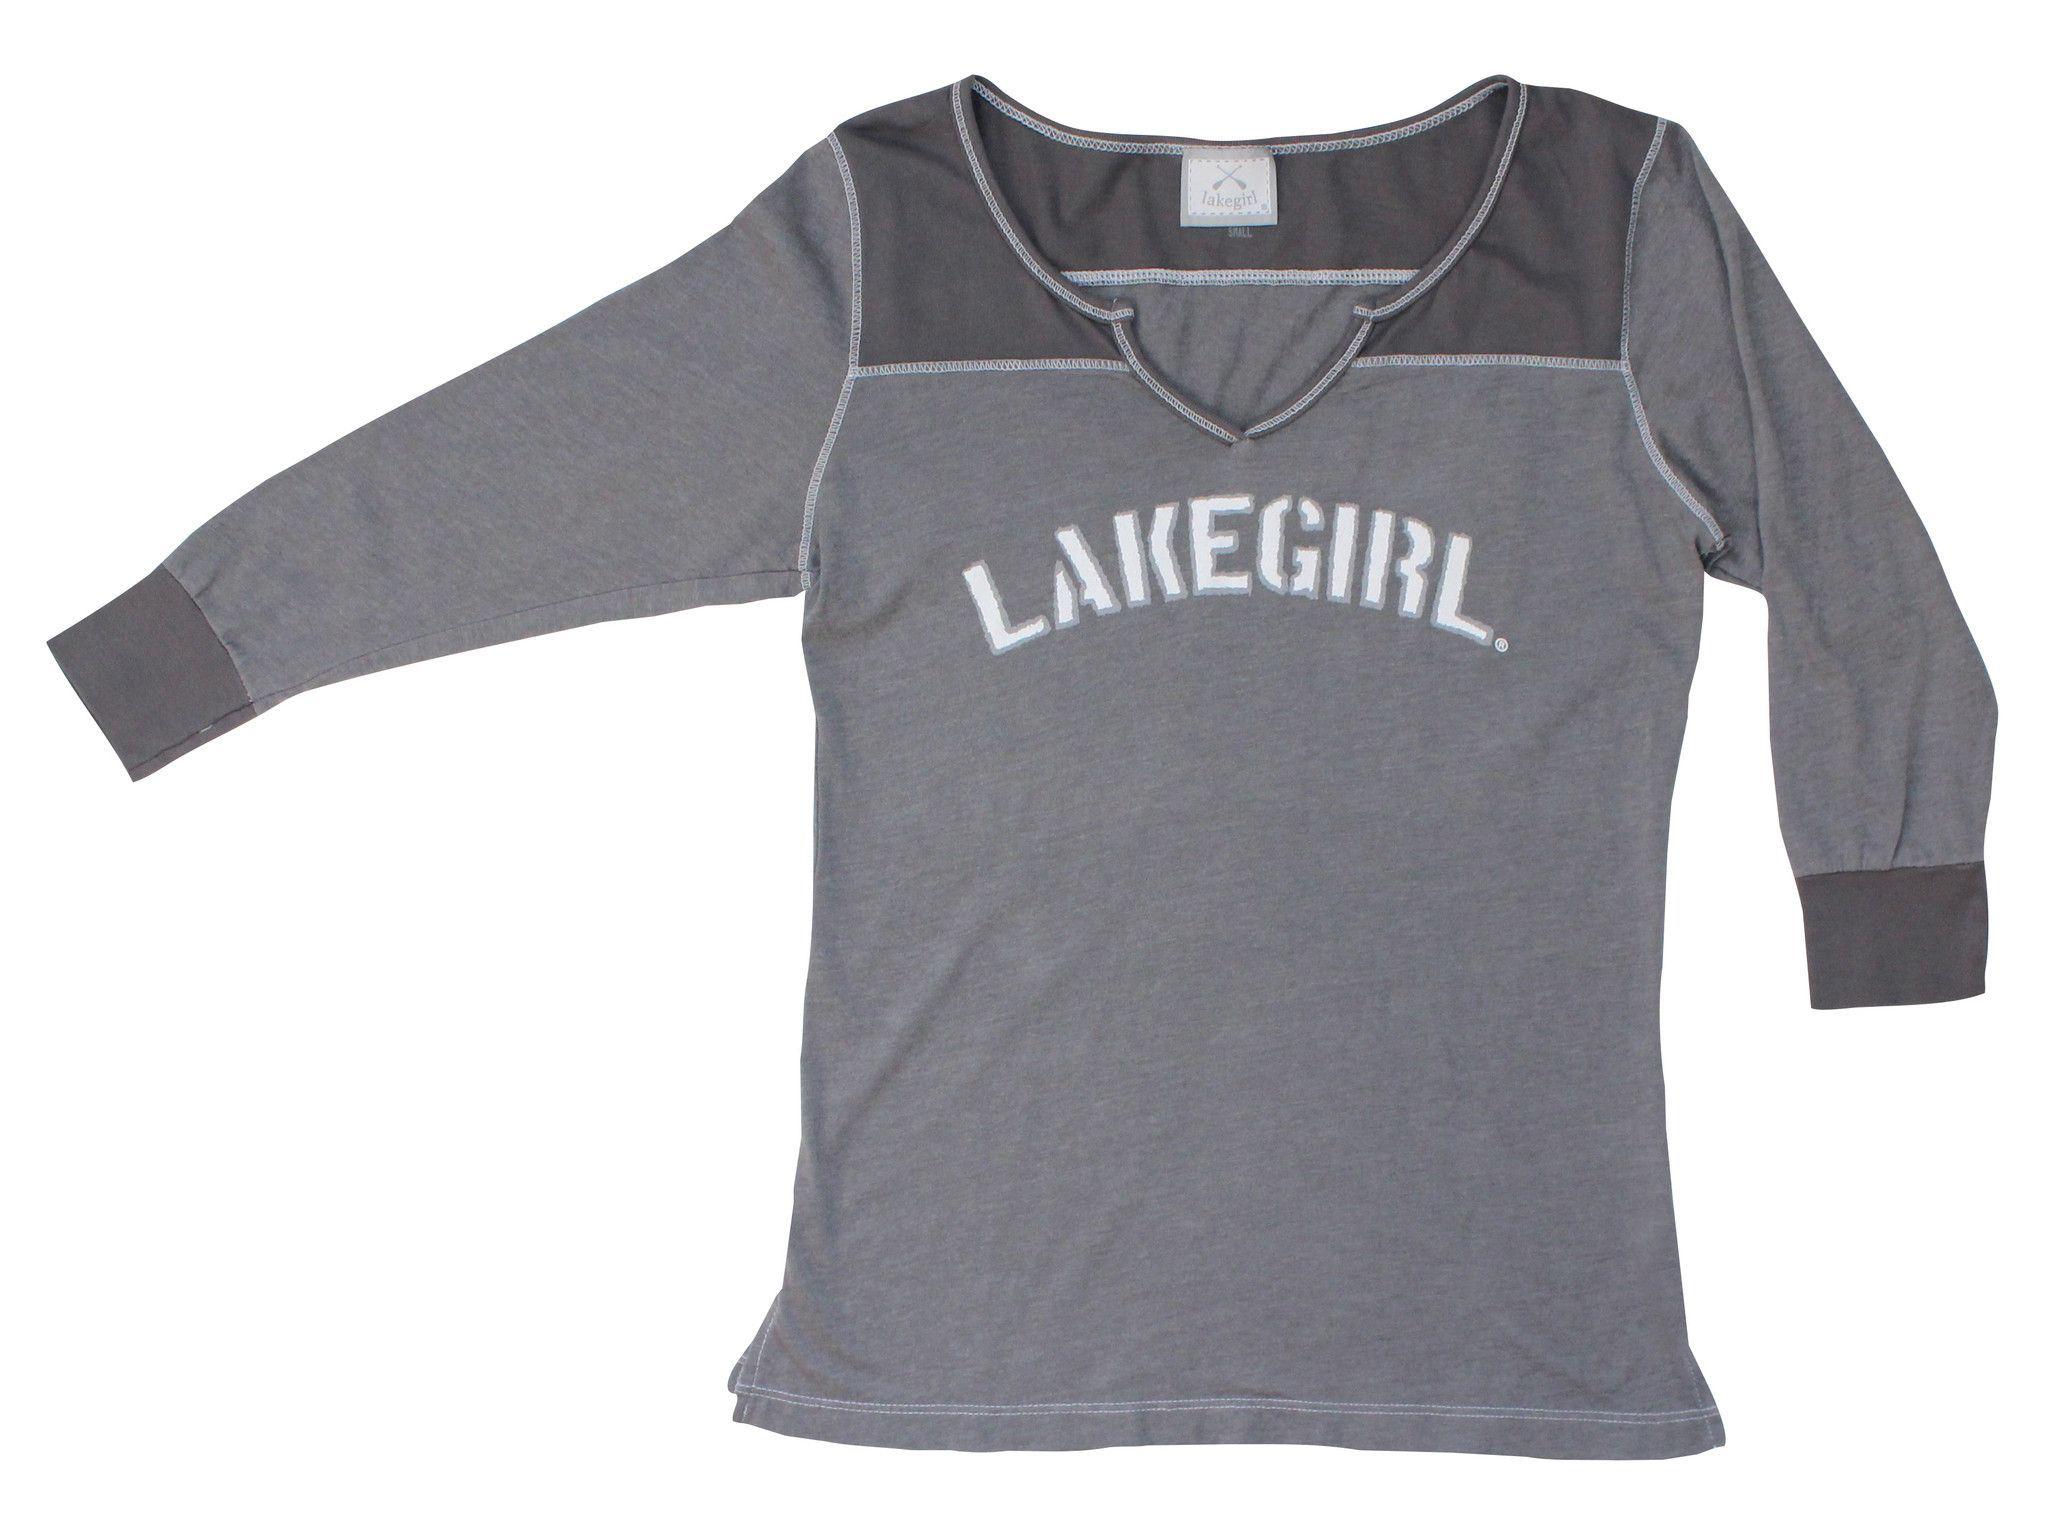 Lakegirl 3/4 sleeve jersey tee shirt